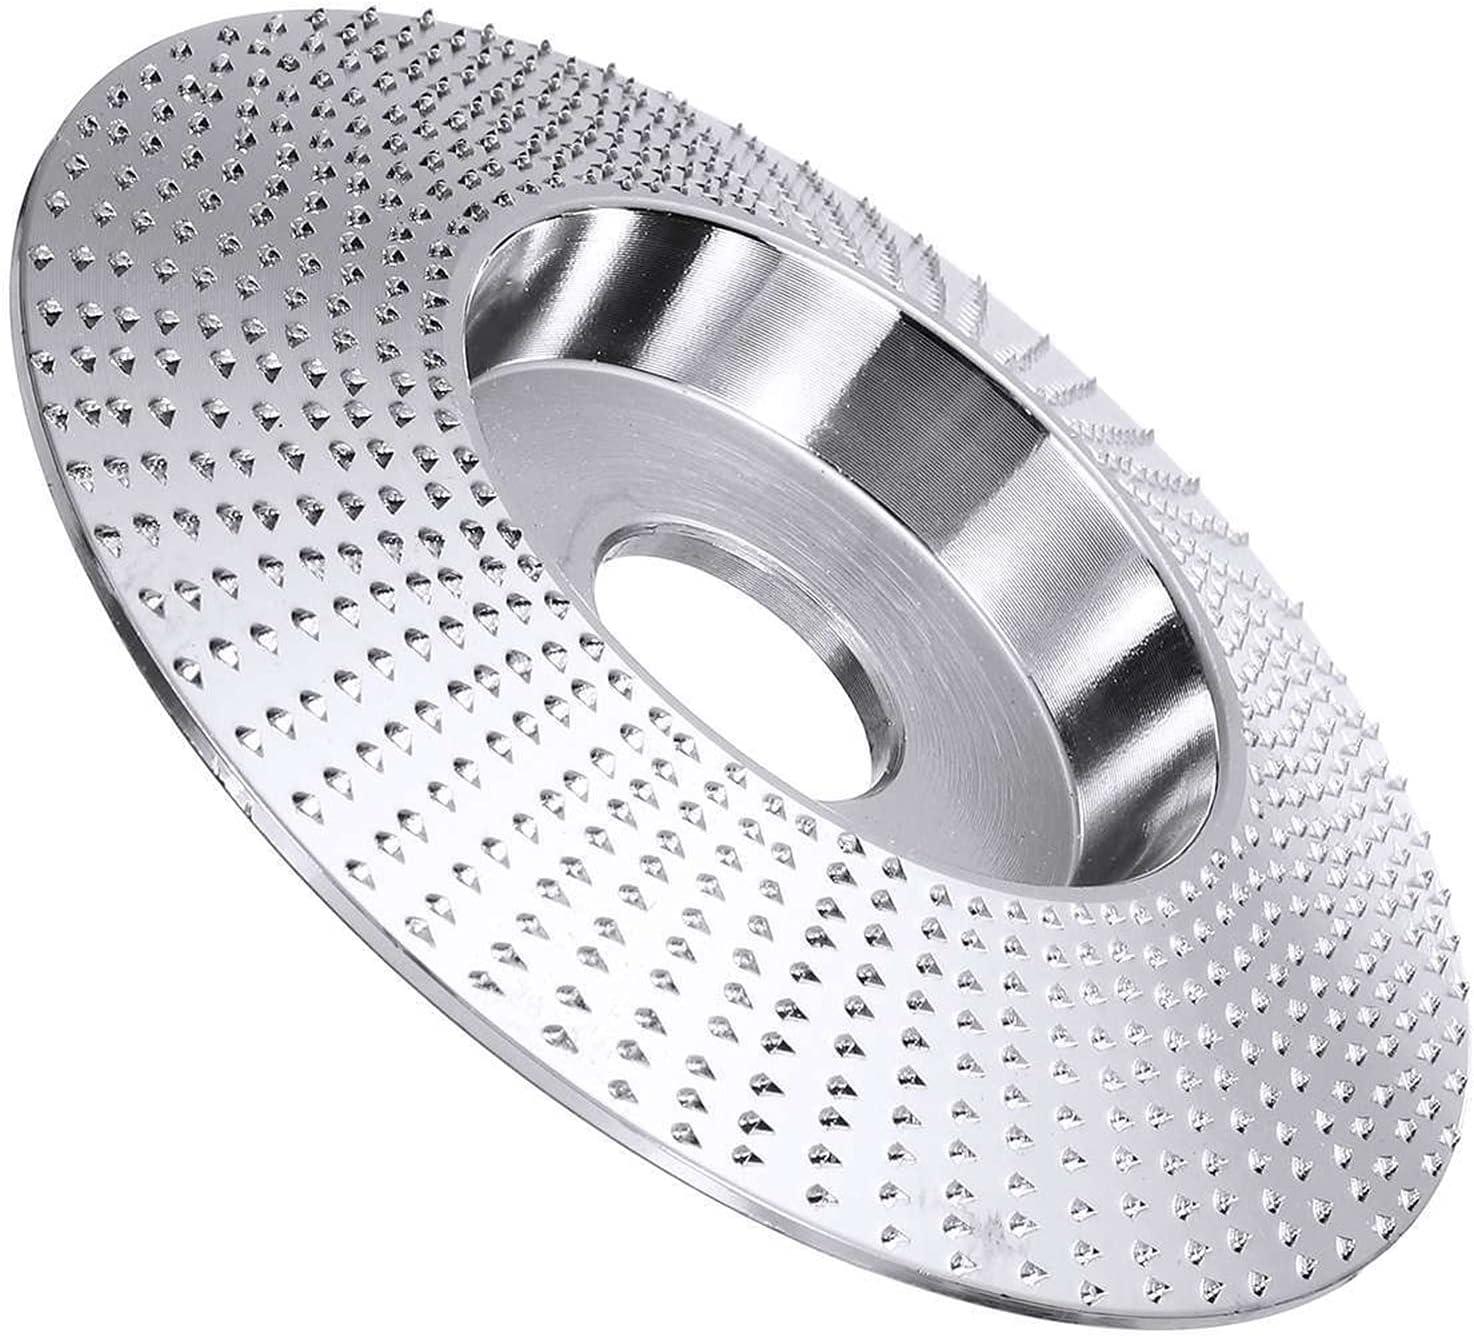 WYDMBH Great interest Cutting wheele 110mm Wood Wheel Sandi Bevel Disc Shipping included Grinding